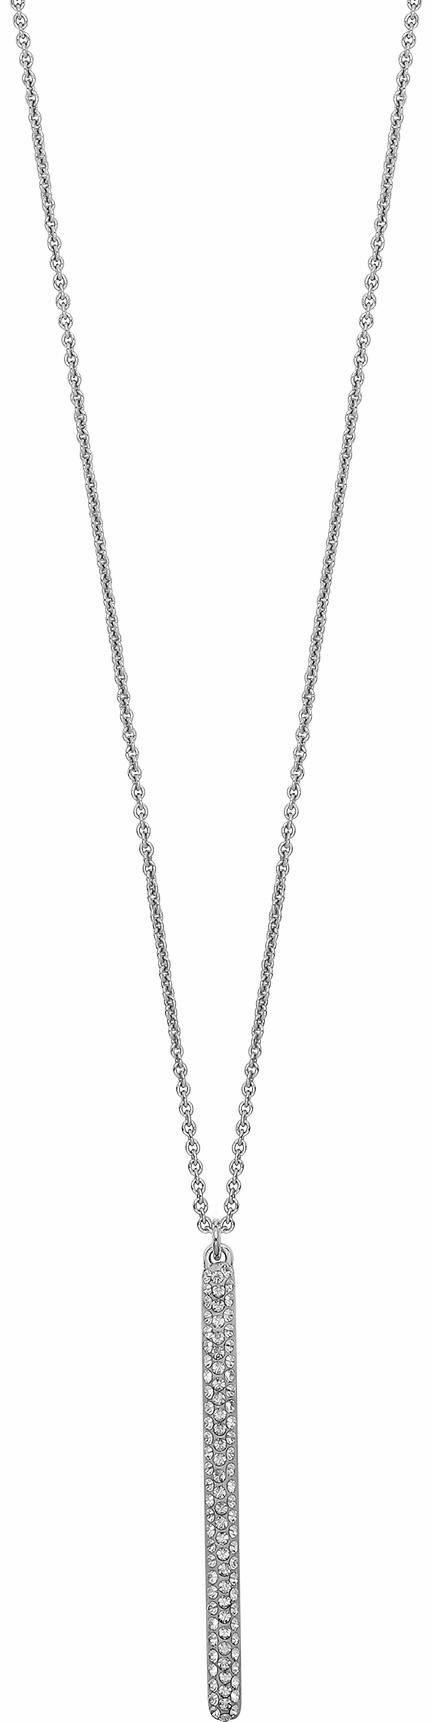 Lolaandgrace Kette mit Anhänger »VEGAS LONG PENDANT, 5216964«, mit Swarovski® Kristallen